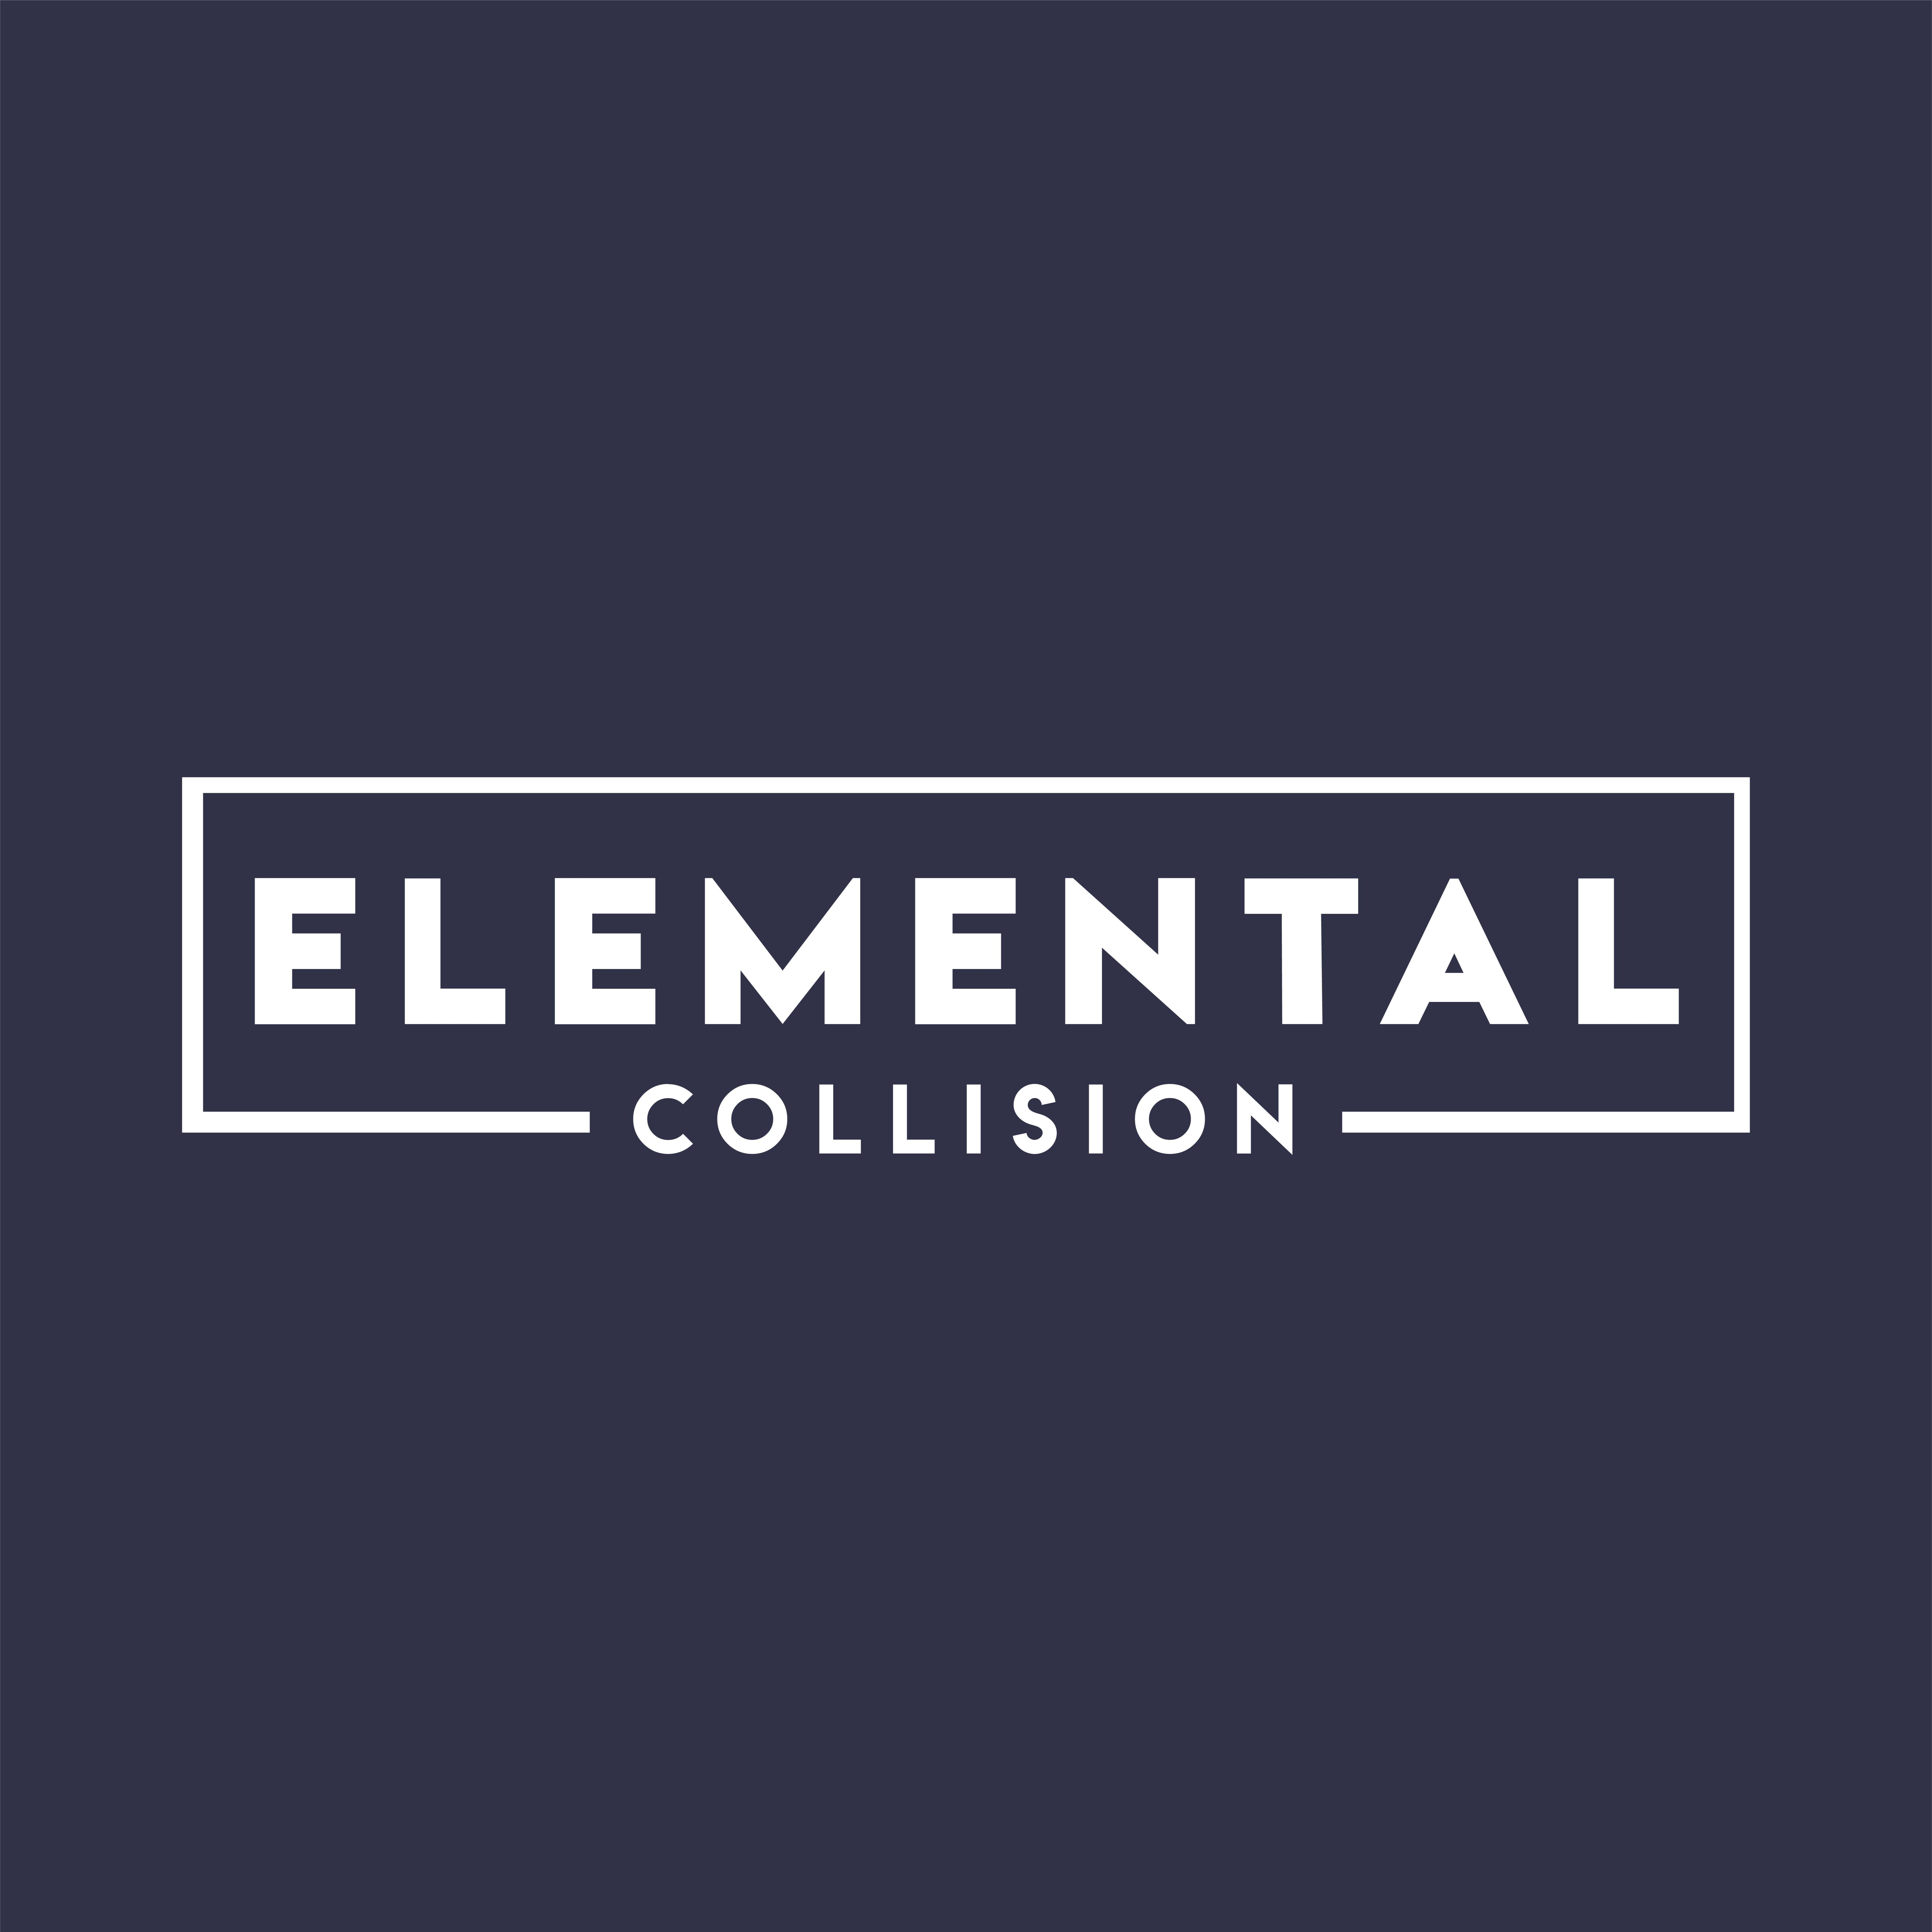 Show artwork for Elemental Collision